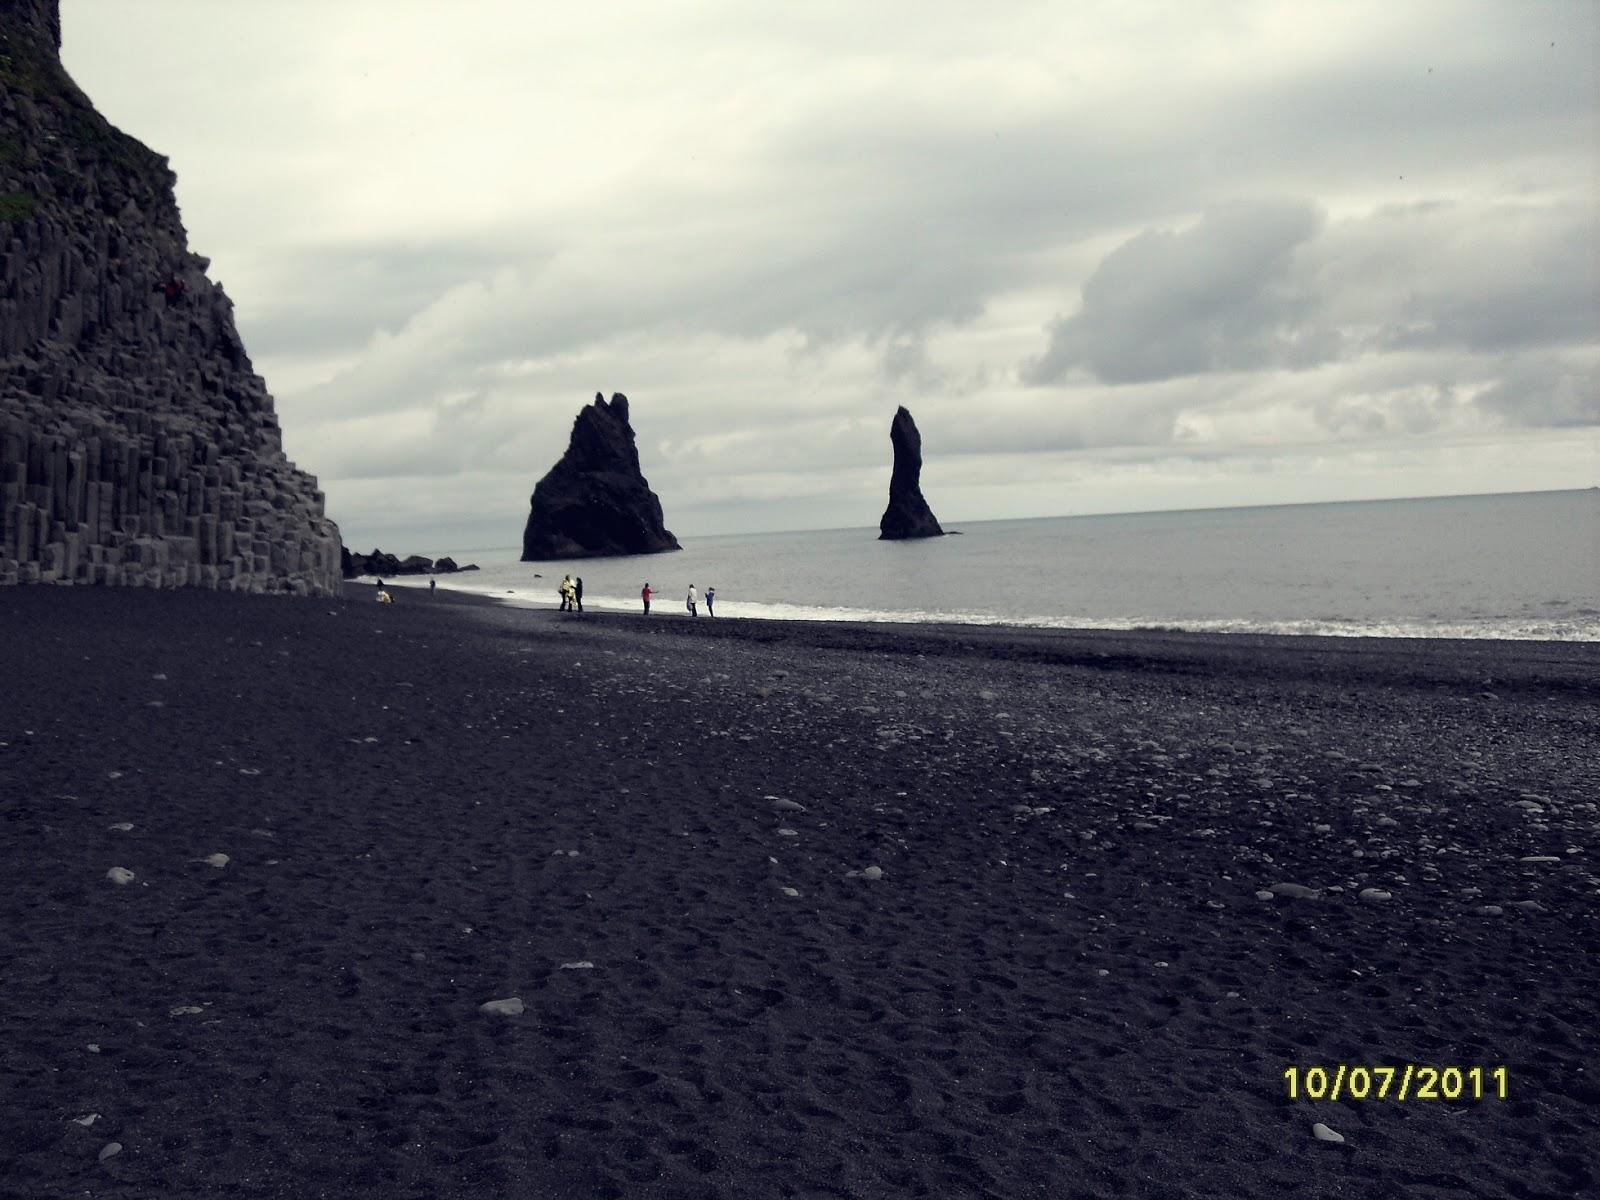 Reynisfjara, plaża Reynisfjara, islandzka plaża, czarna plaża, Islandia, południowa Islandia